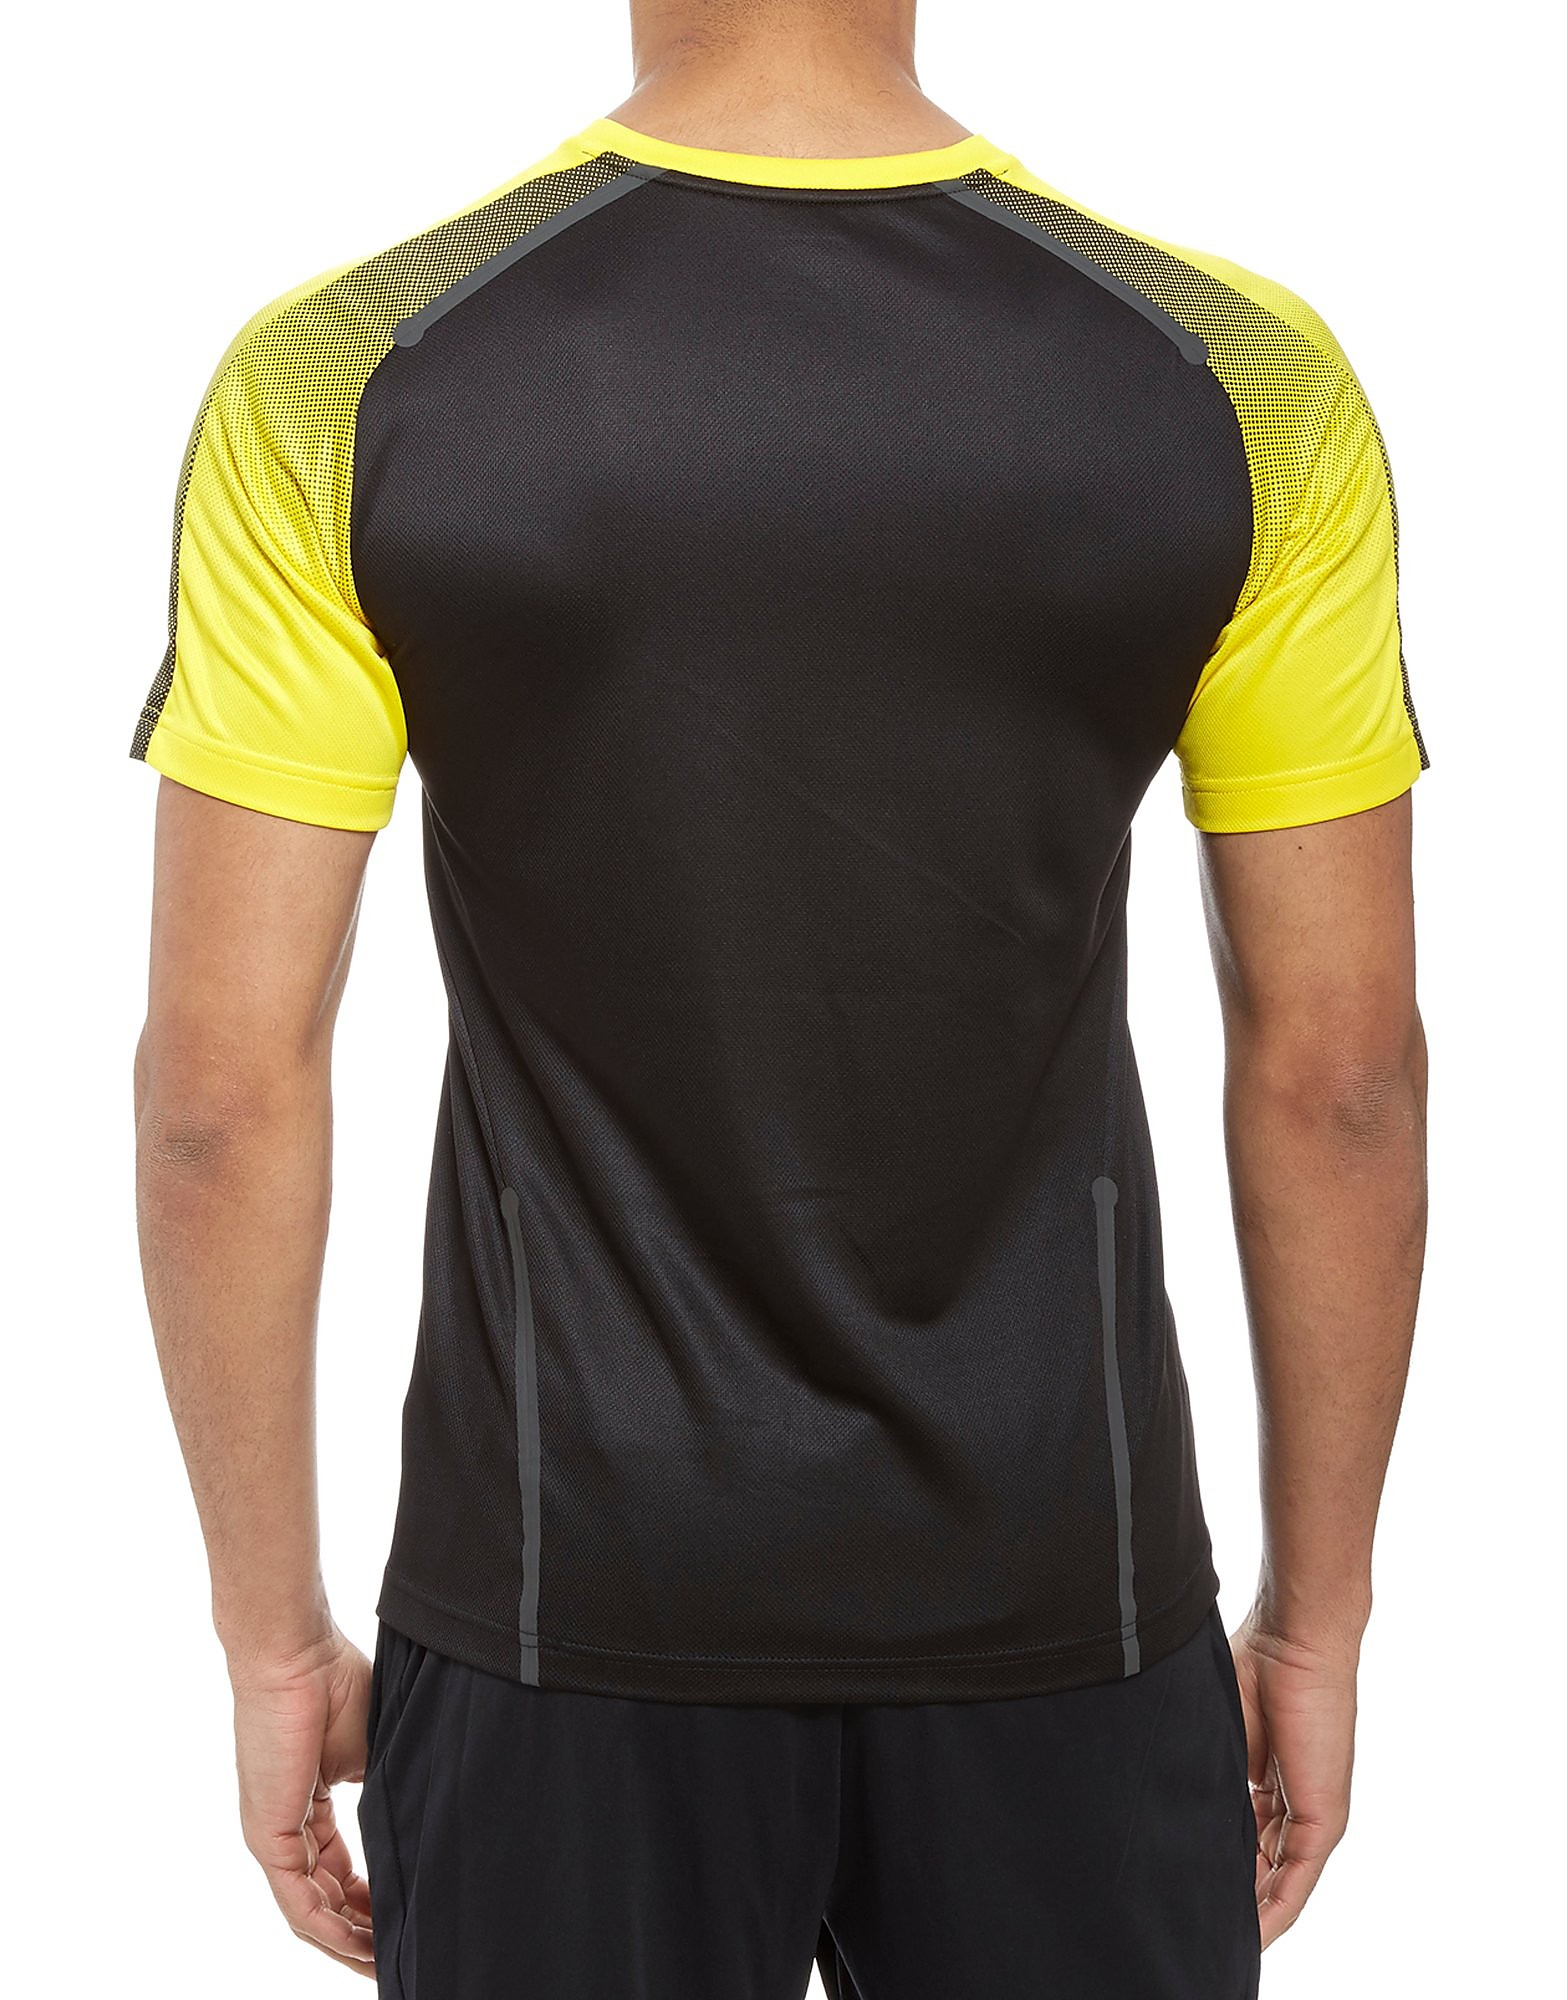 PUMA Borussia Dortmund 2017/18 Stadium T-Shirt